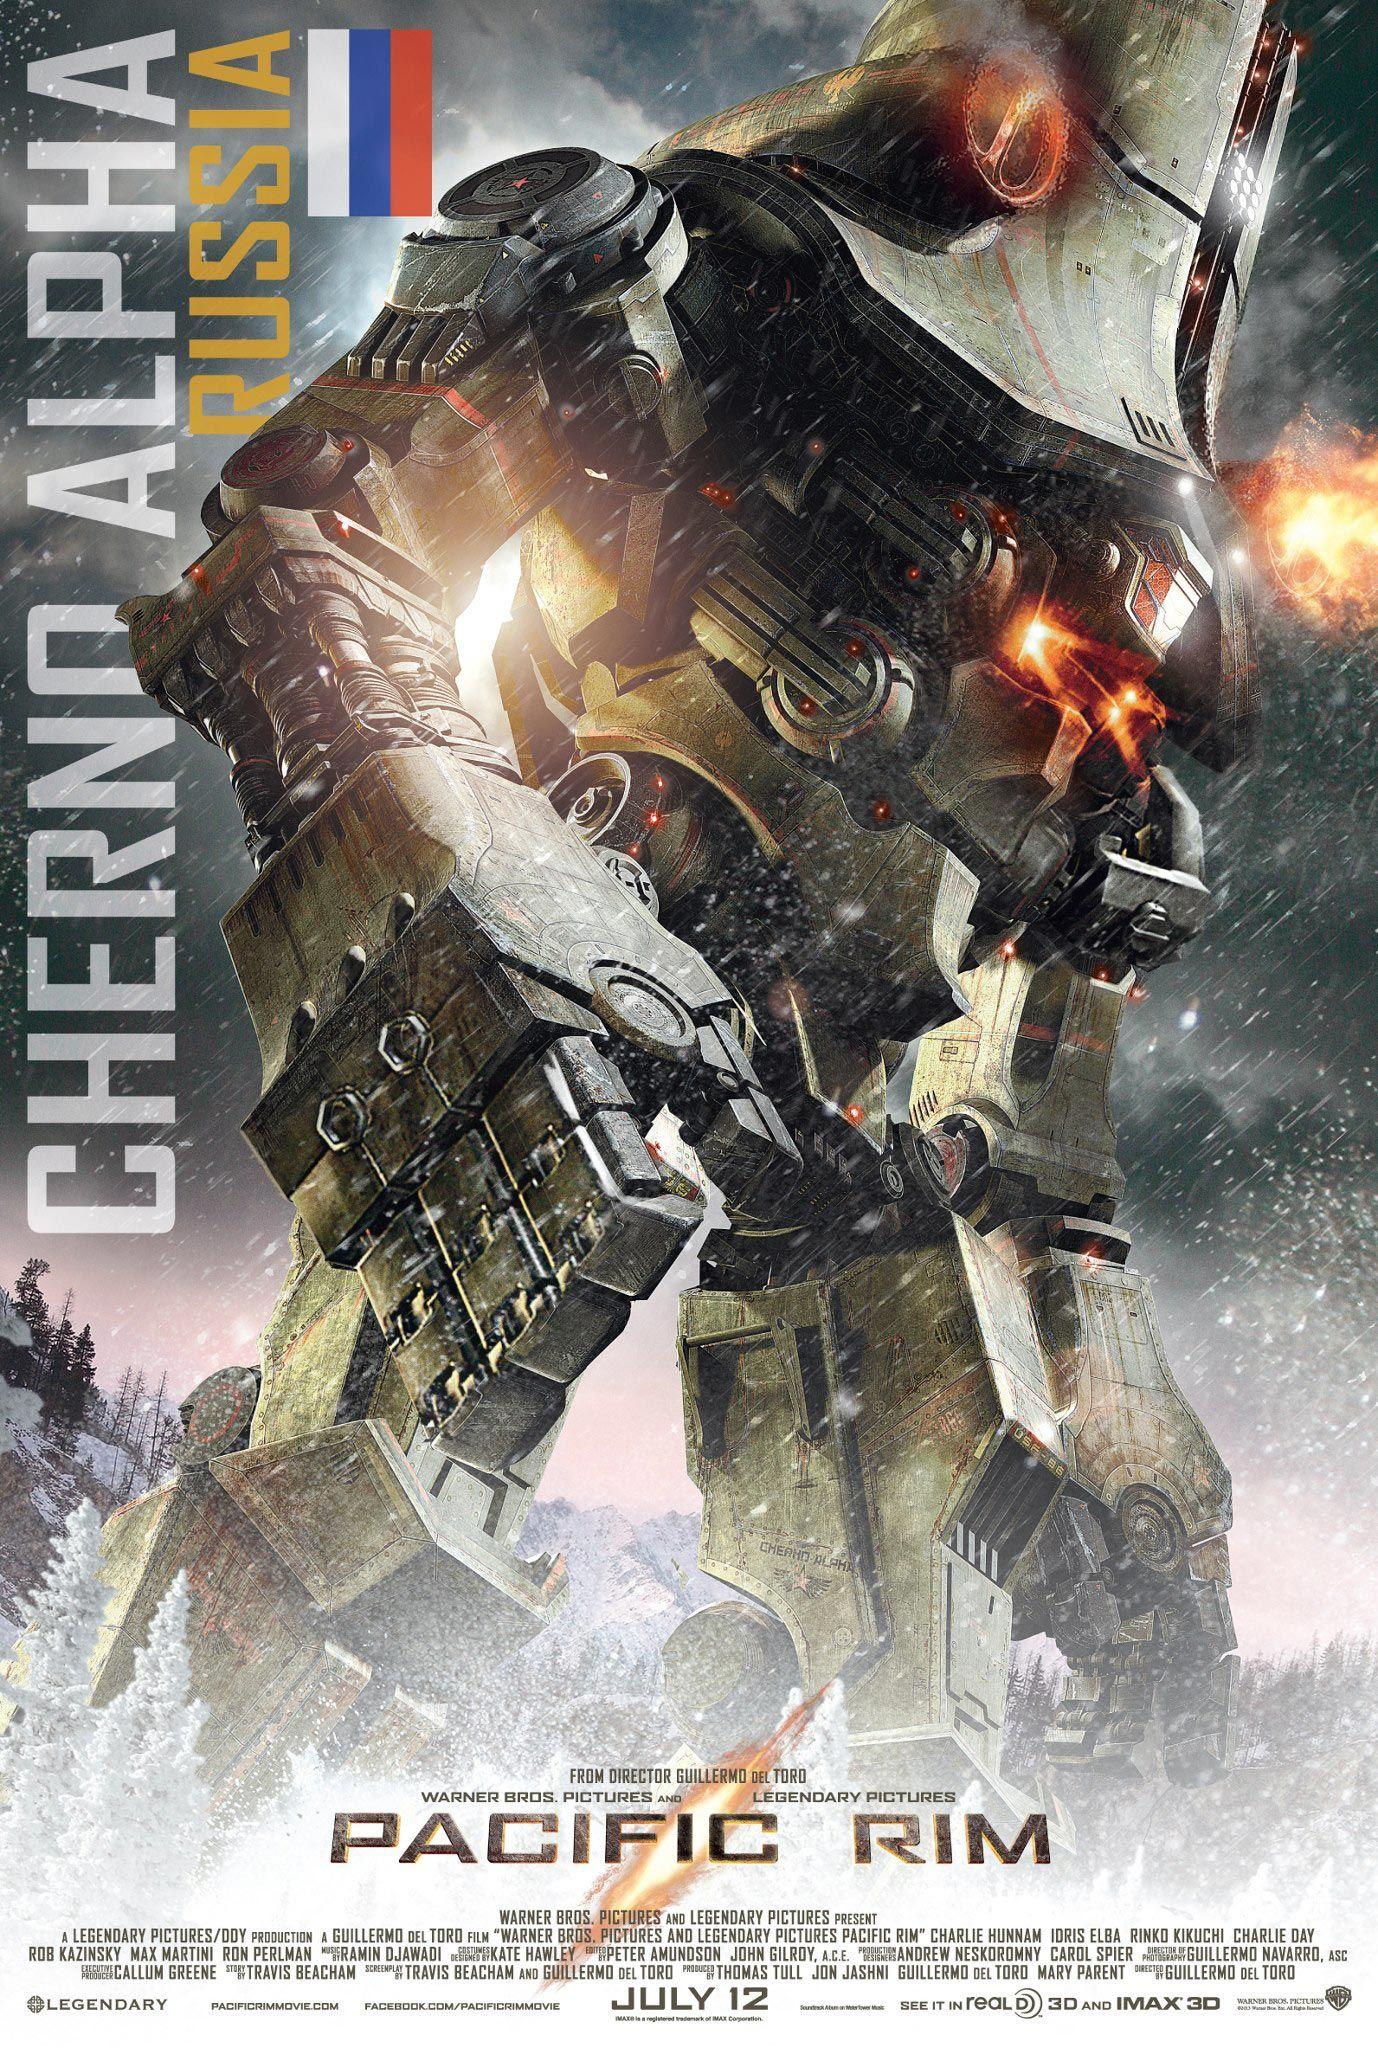 PACIFIC RIM Character Posters, Coyote Tango, Cherno Alpha, Crimson Typhoon and Striker Eureka